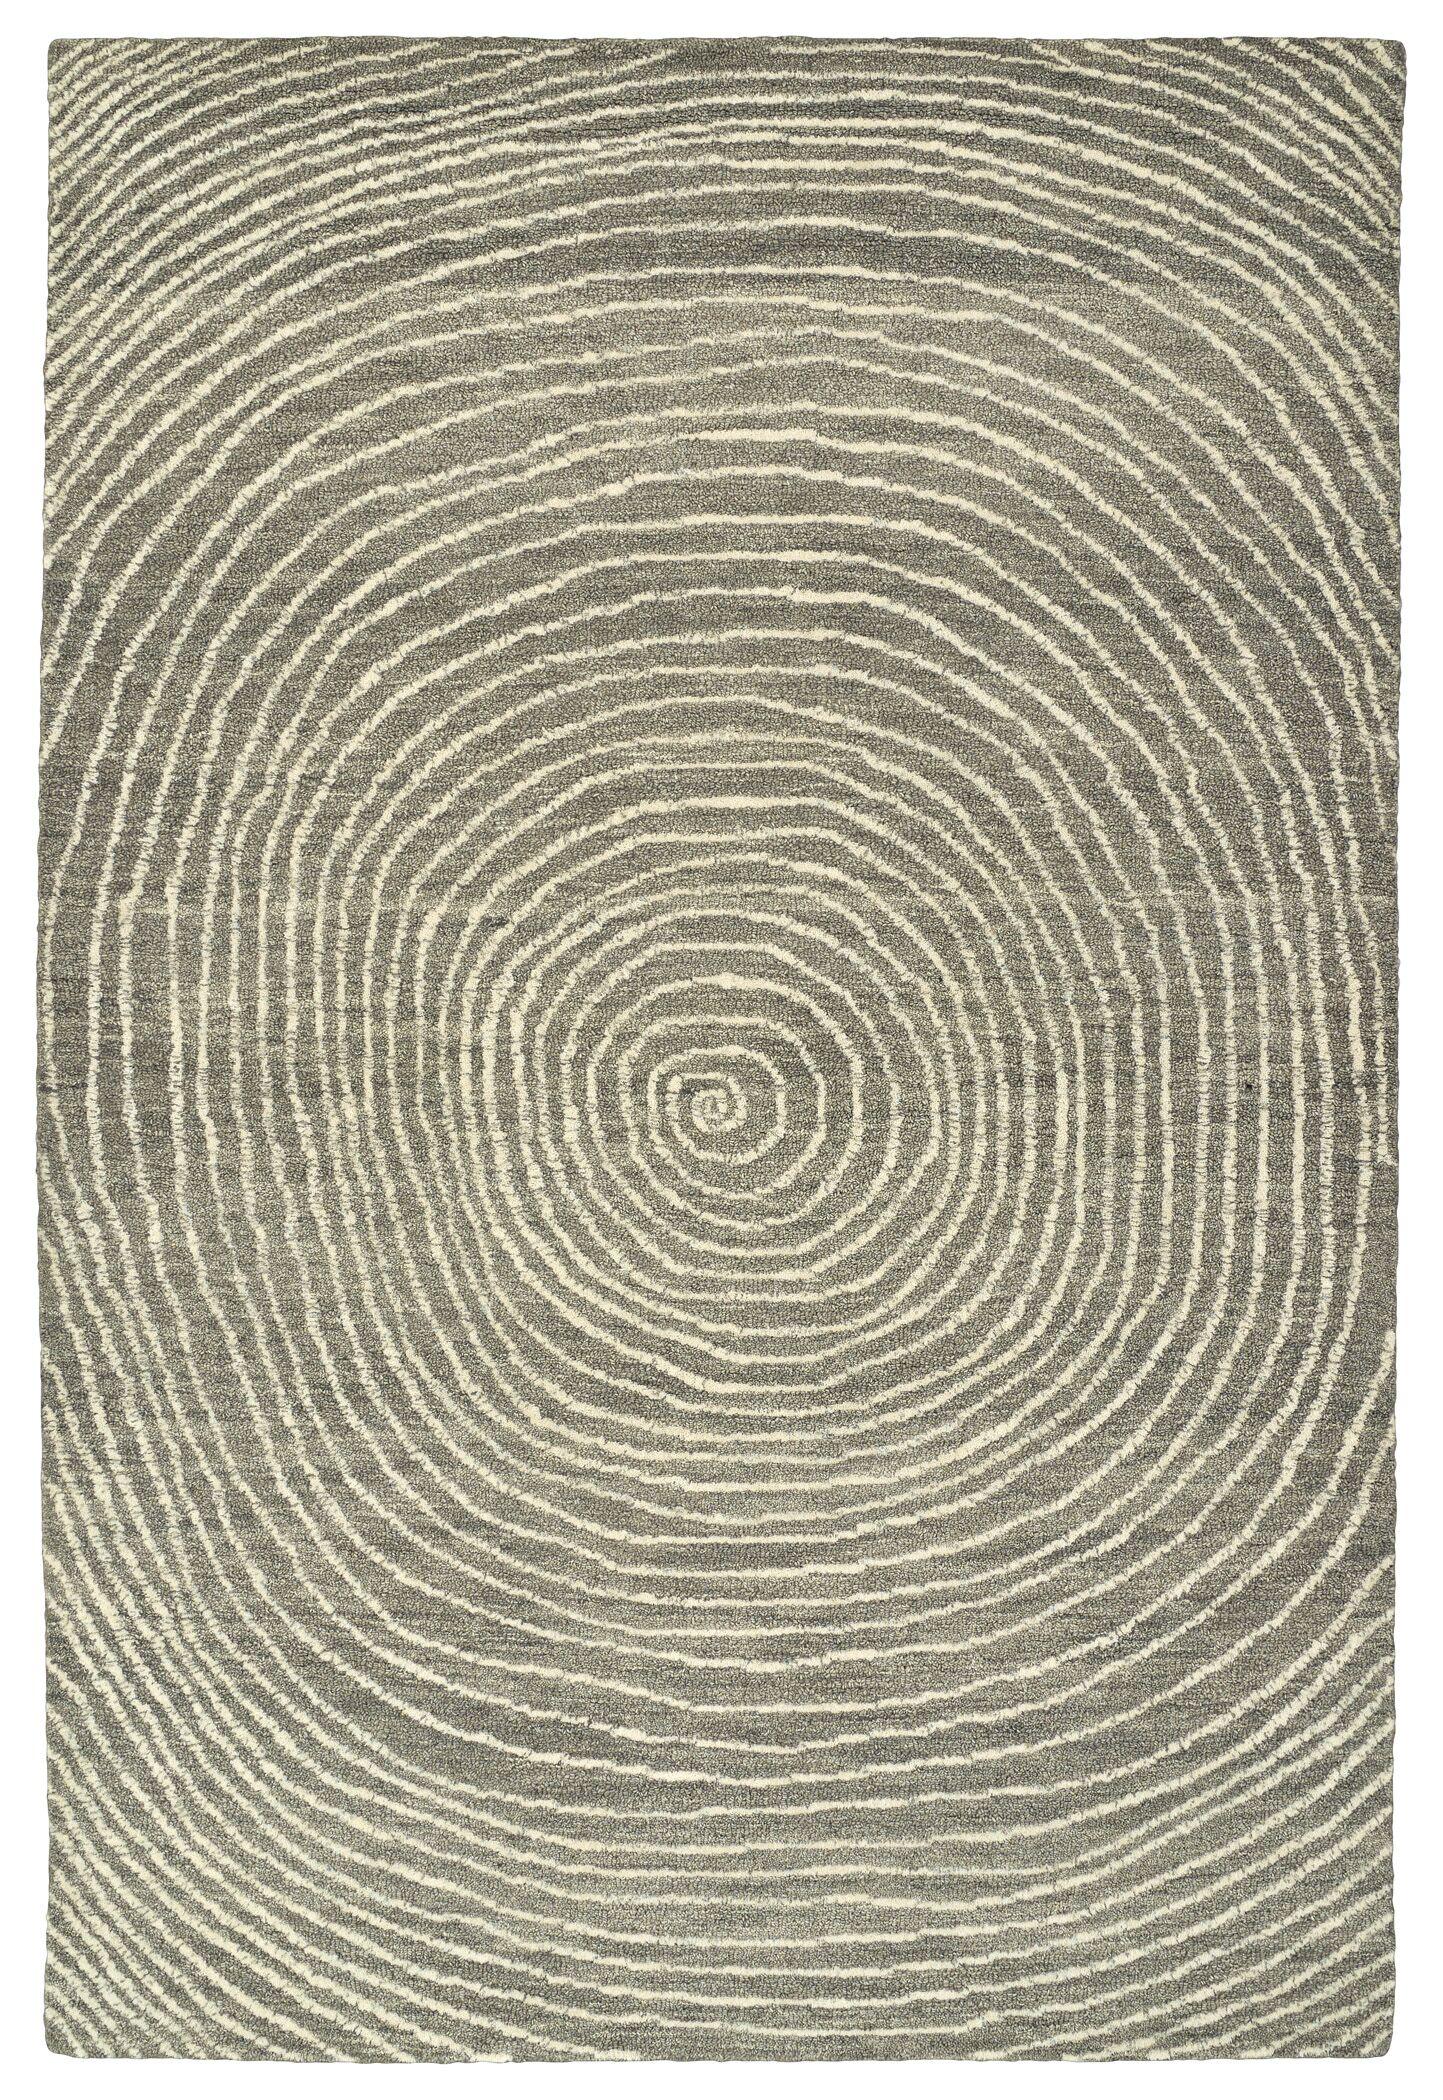 Caneadea Hand-Tufted Gray Area Rug Rug Size: Rectangle 3'6